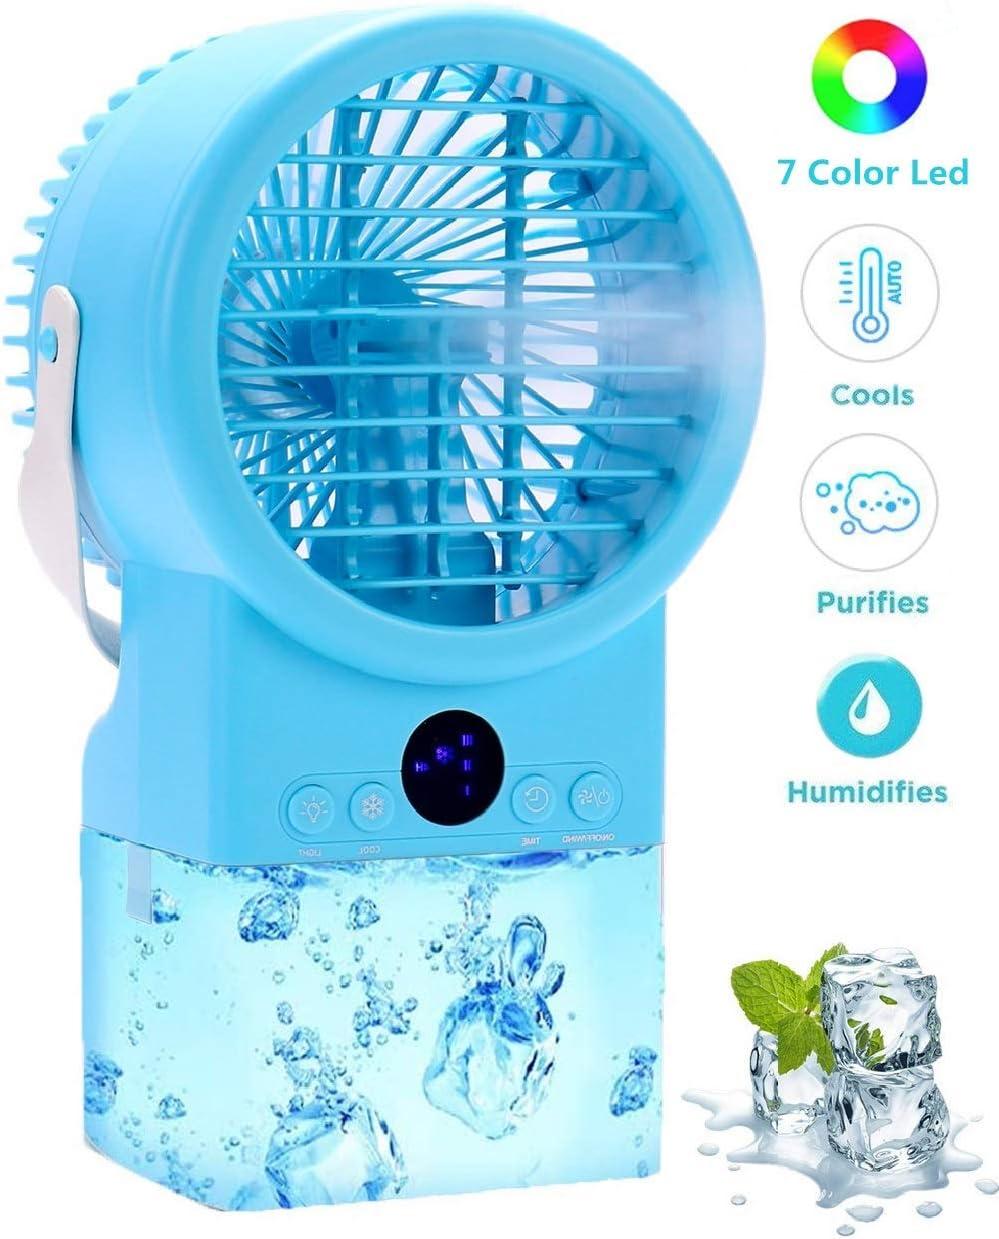 Temporizador Silencioso,3 Velocidades,7 Colores Luz Ajustable Mini Enfriador de Aire Humidificador con Mango Trabajo y Hogar Aire Acondicionado Port/átil